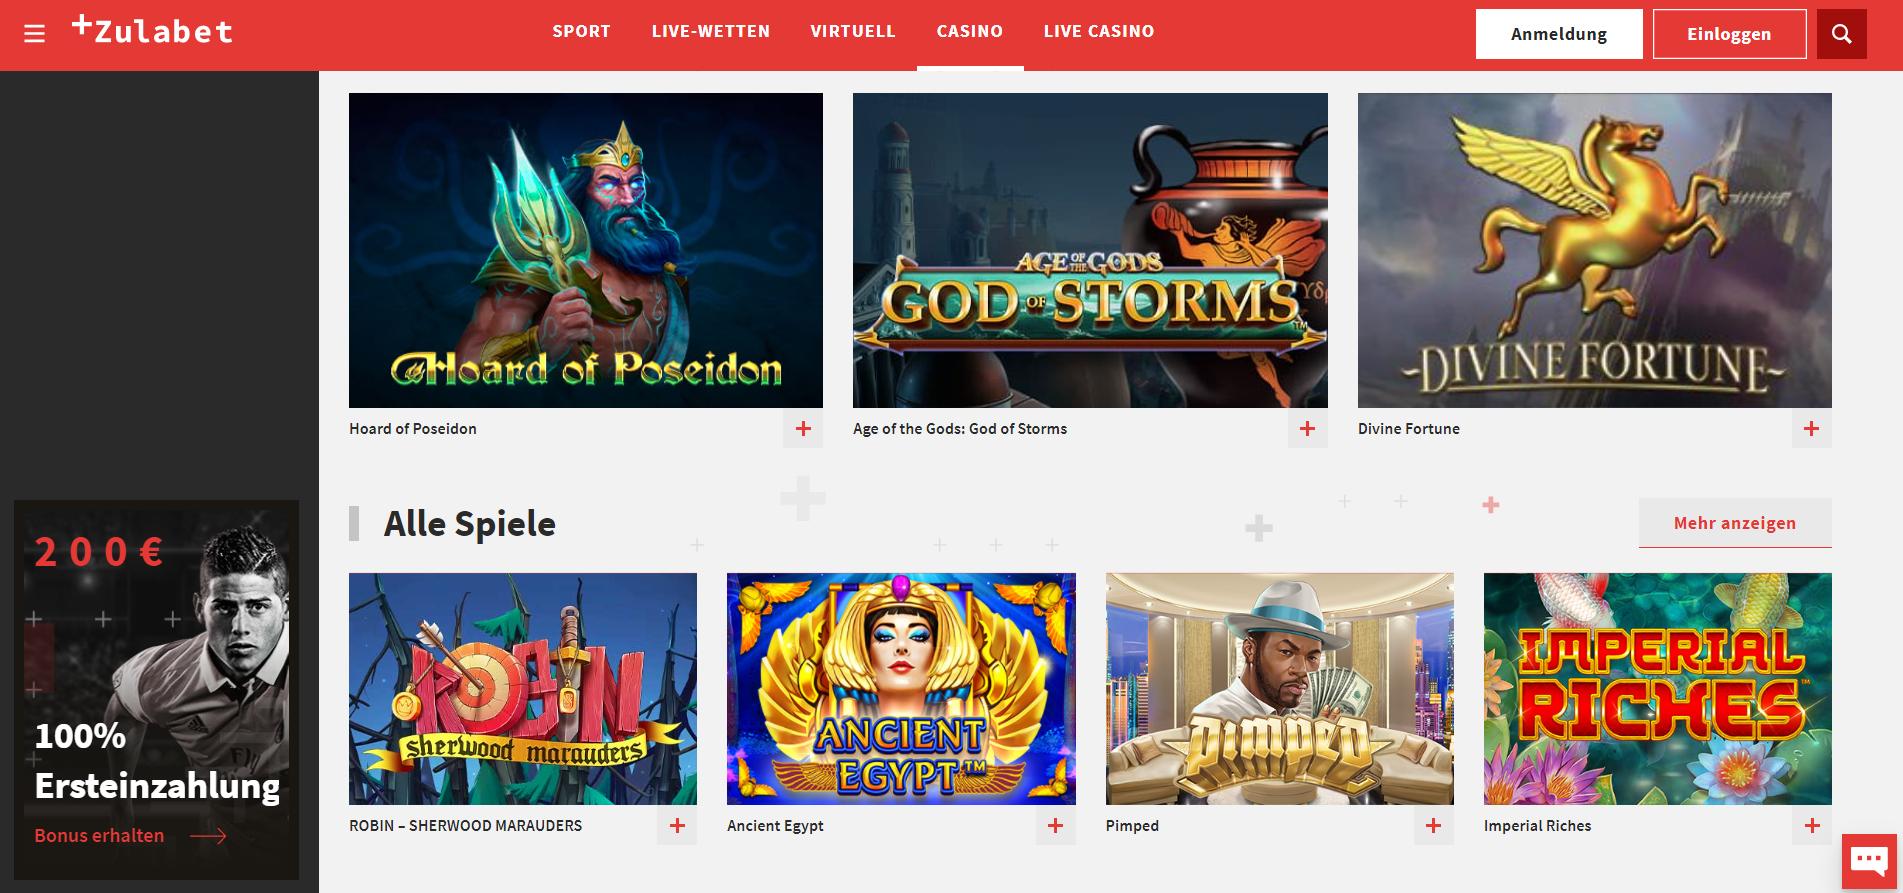 zulabet-willkommensbonus-online-casino